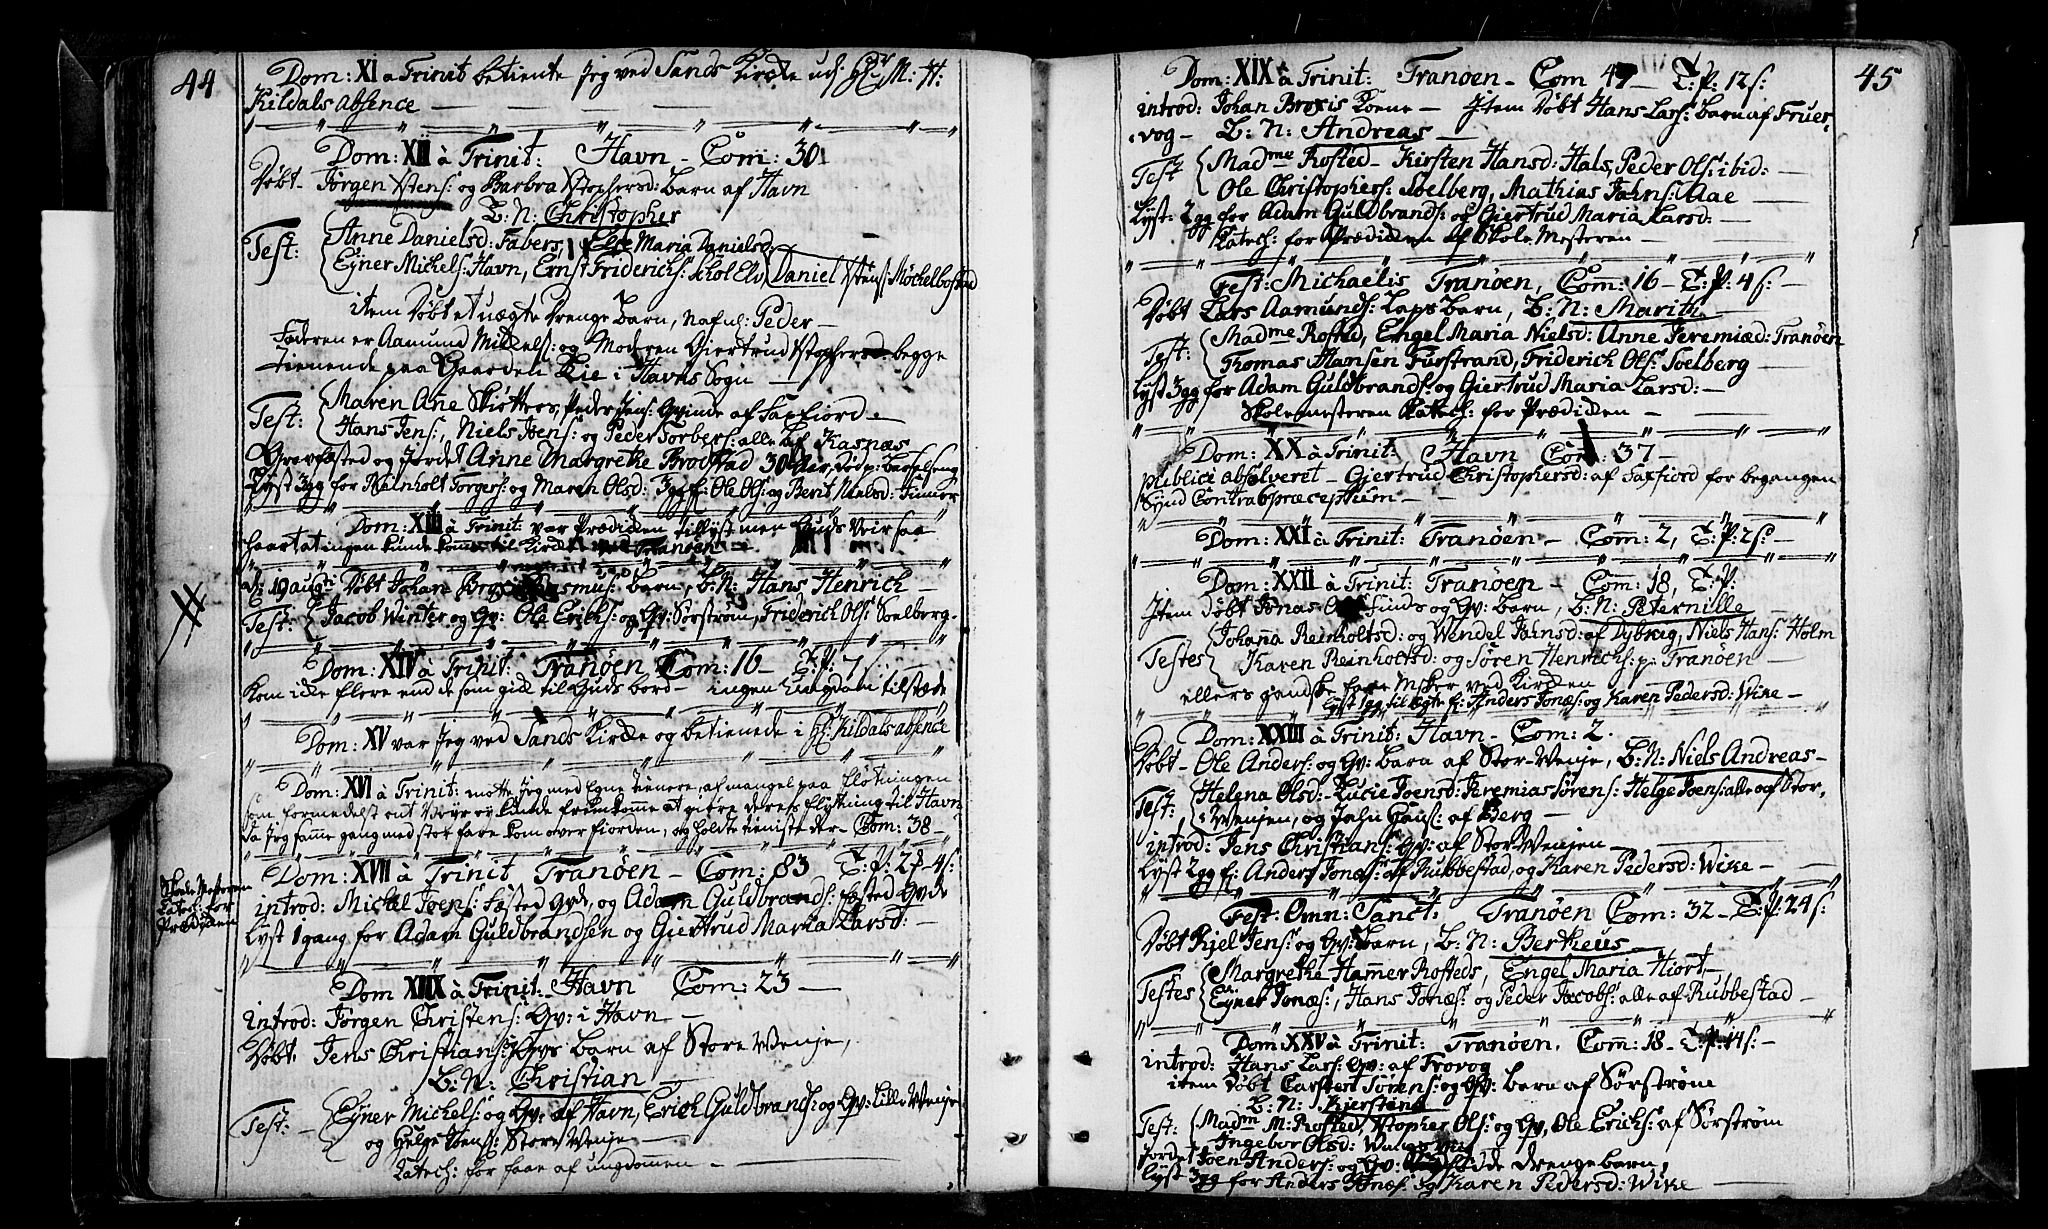 SATØ, Tranøy sokneprestkontor, I/Ia/Iaa/L0001kirke: Ministerialbok nr. 1, 1757-1773, s. 44-45